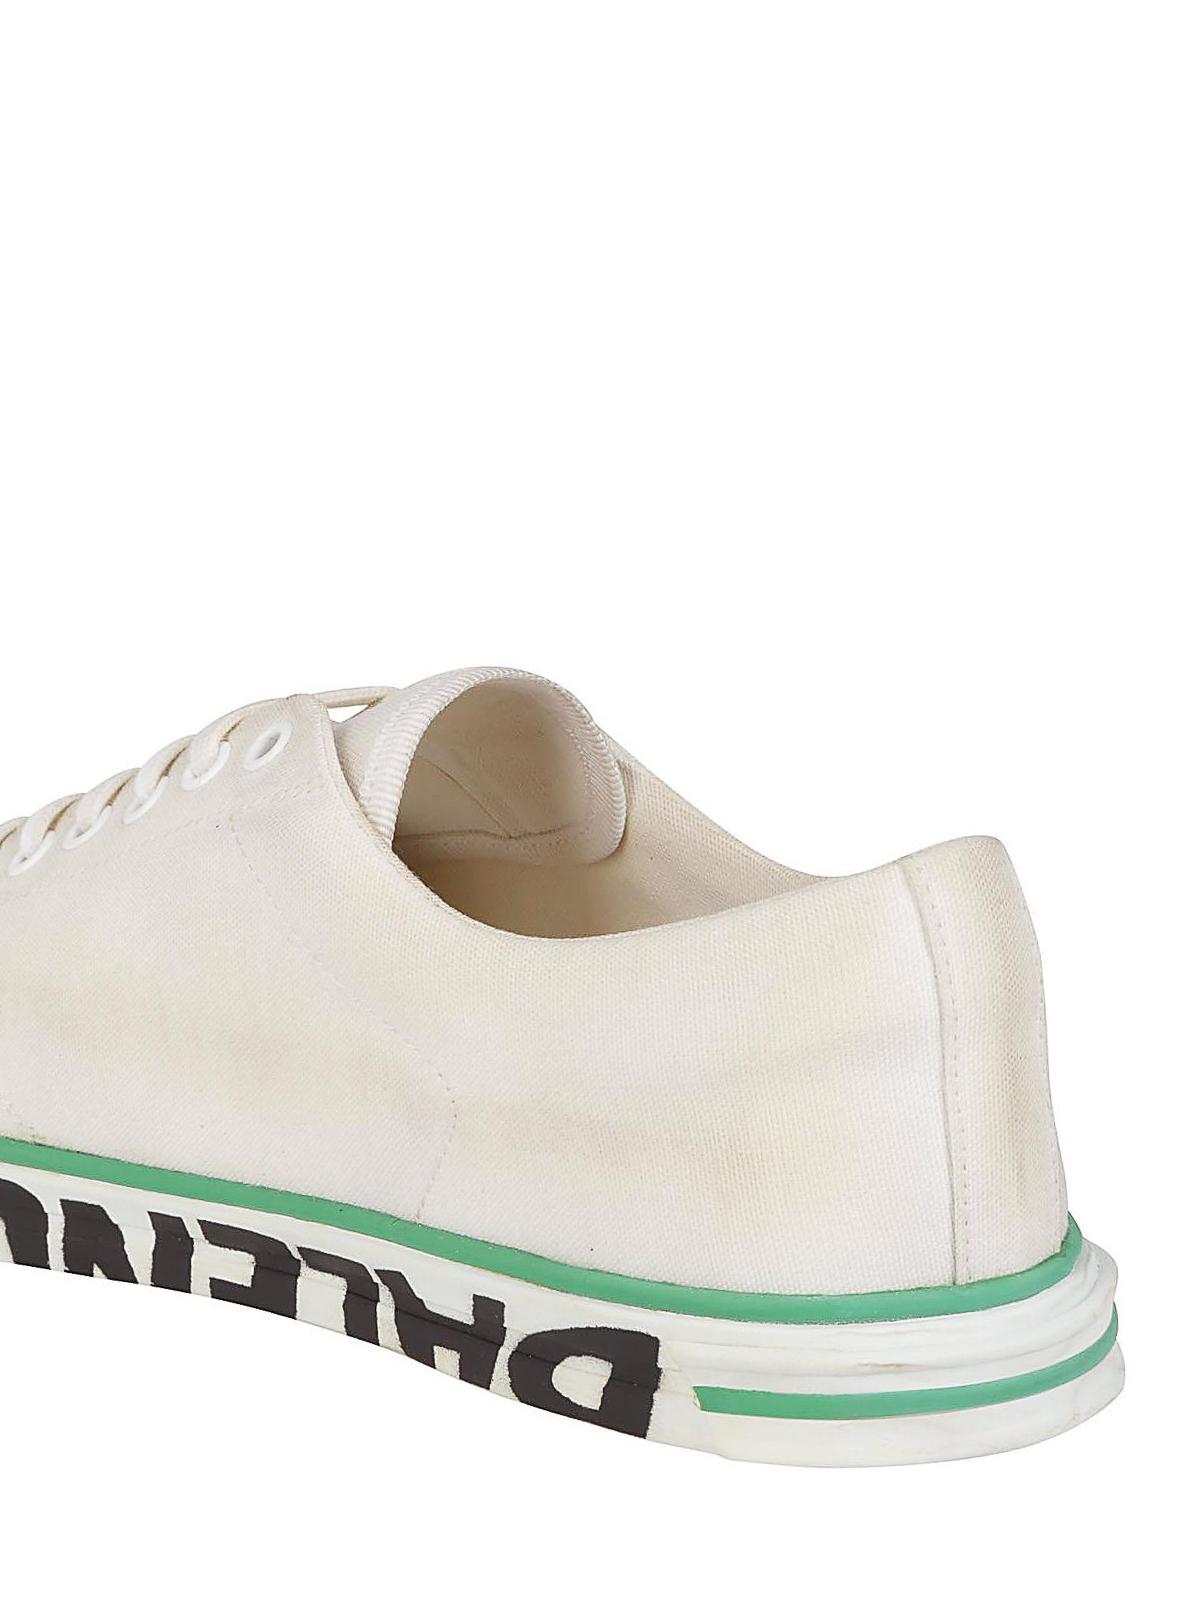 57a106b2297b6 Balenciaga - Sneaker in tela di cotone effetto sporco - sneakers ...